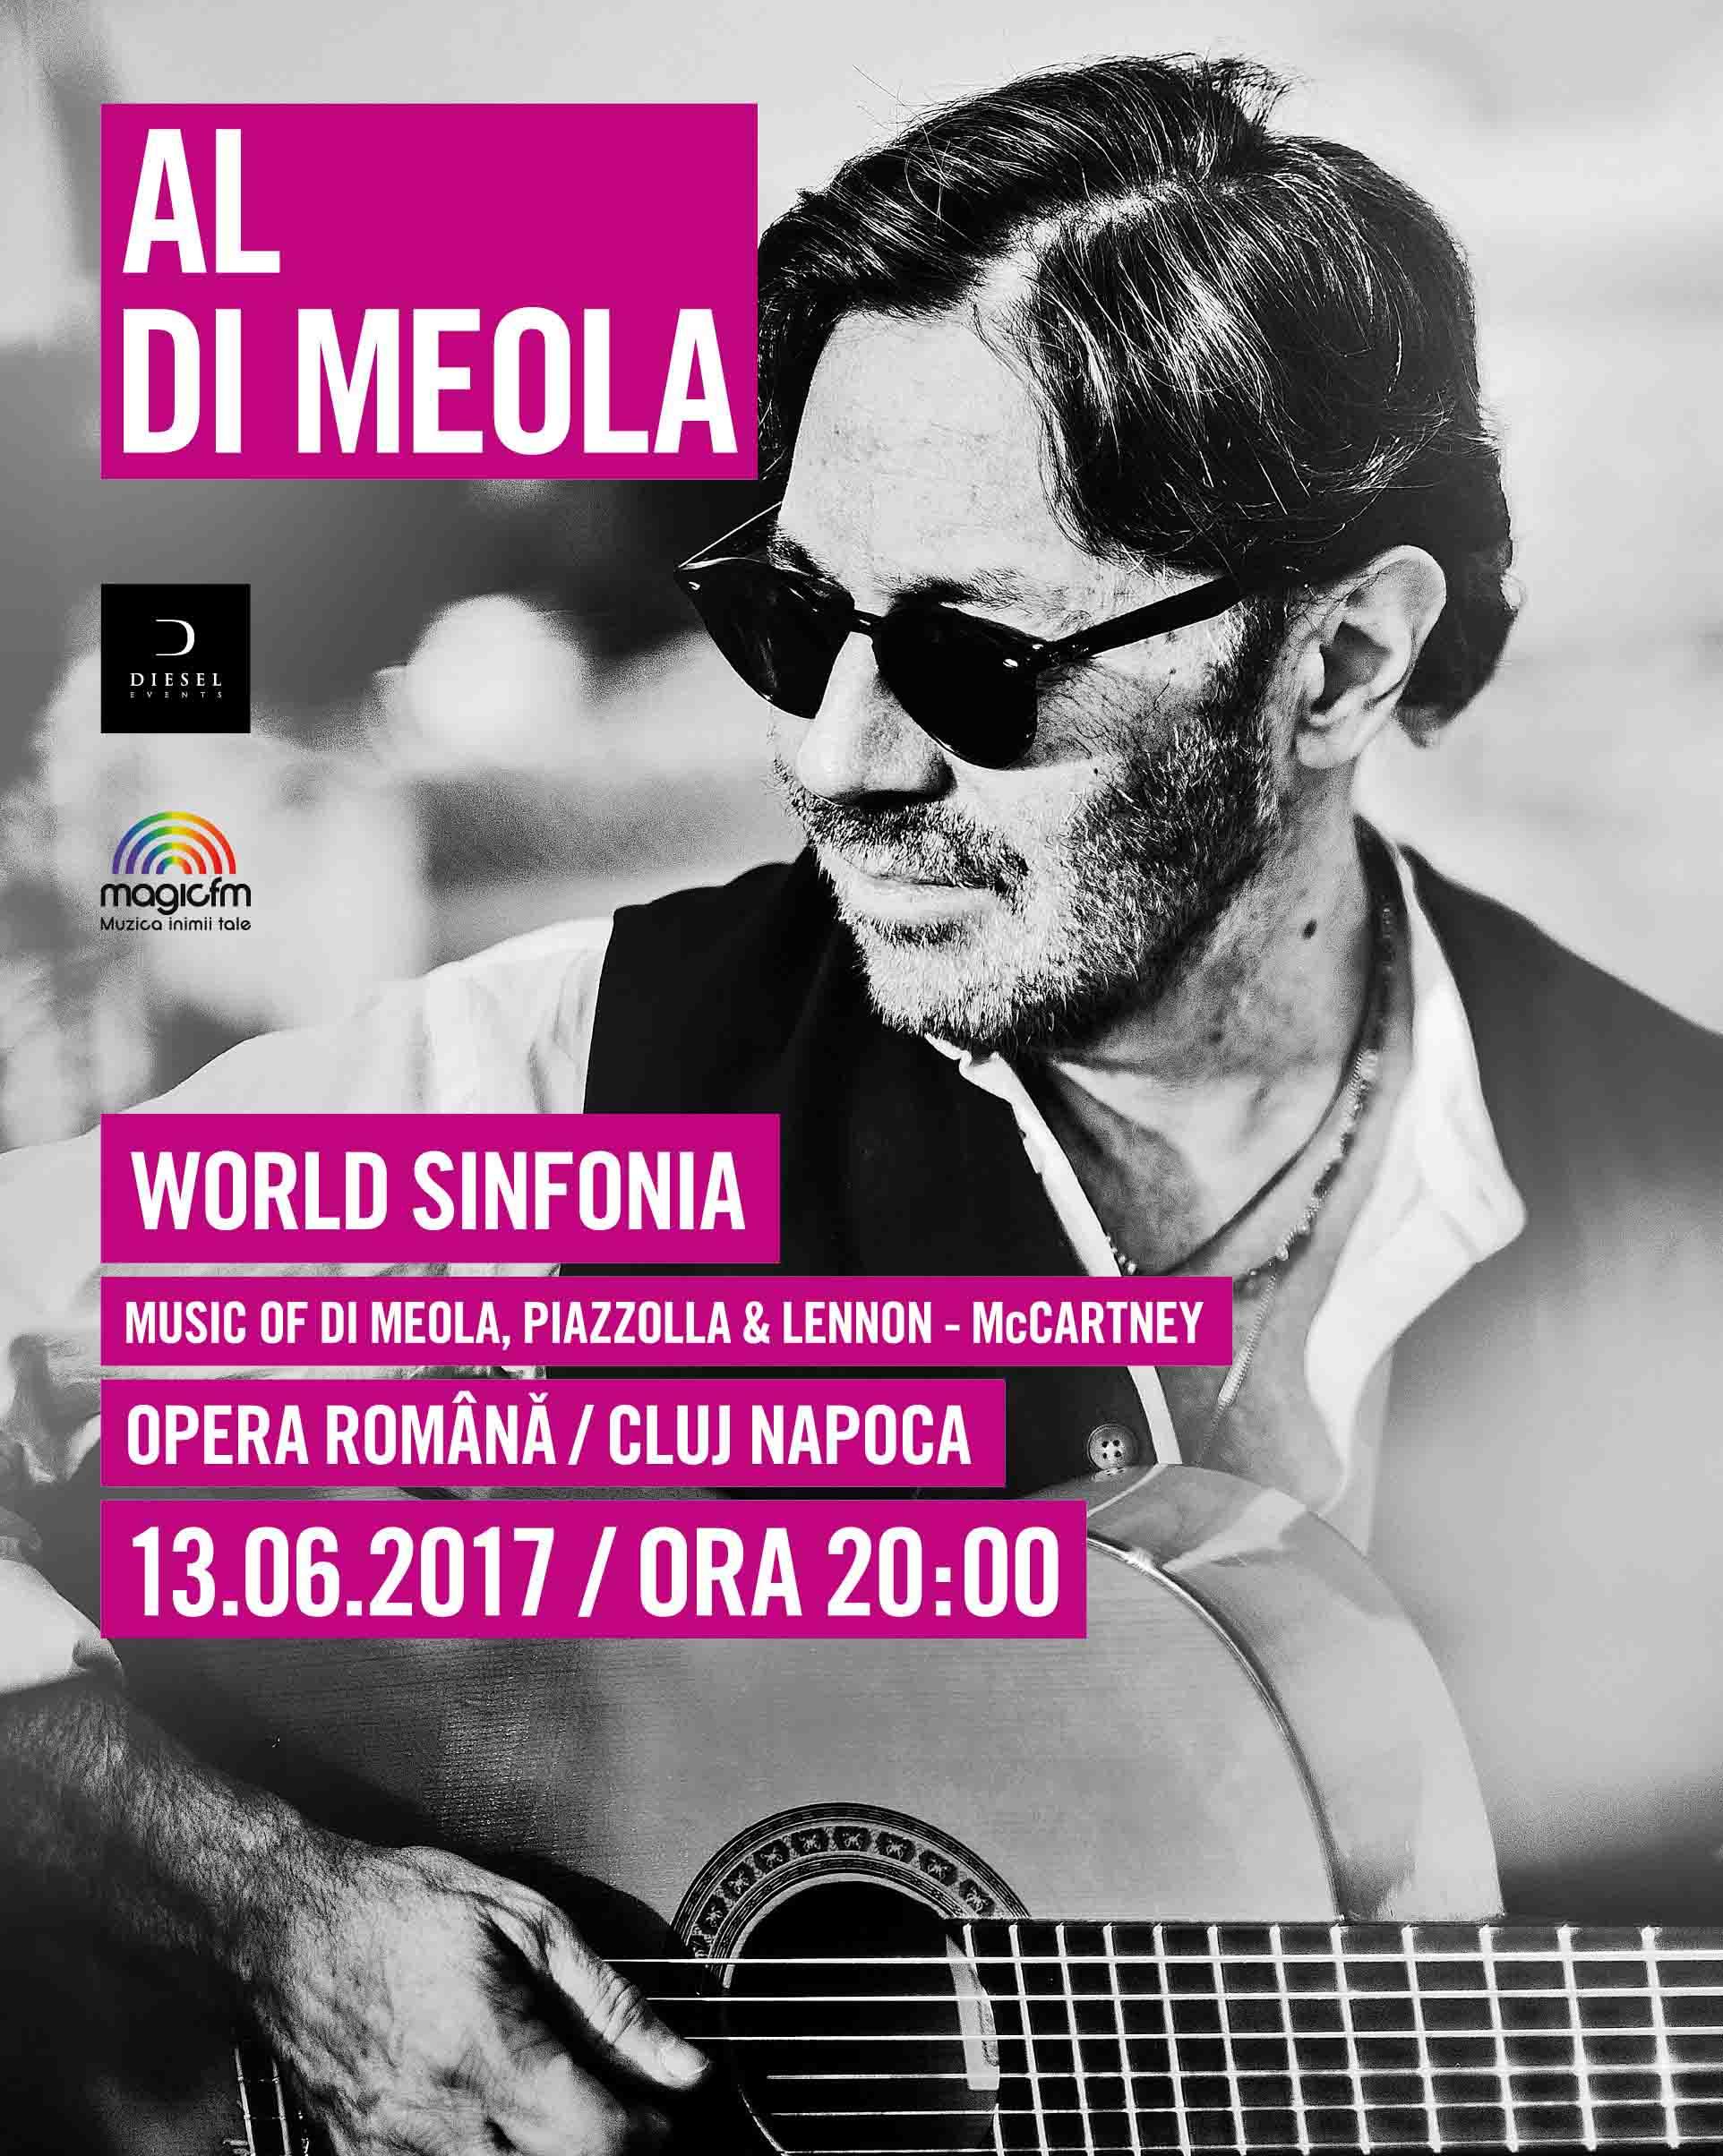 "Al Di Meola revine la Cluj-Napoca cu cel mai bun concert al său ""Music of Di Meola, Piazzolla & Lennon-McCartney"", la Opera Romana"